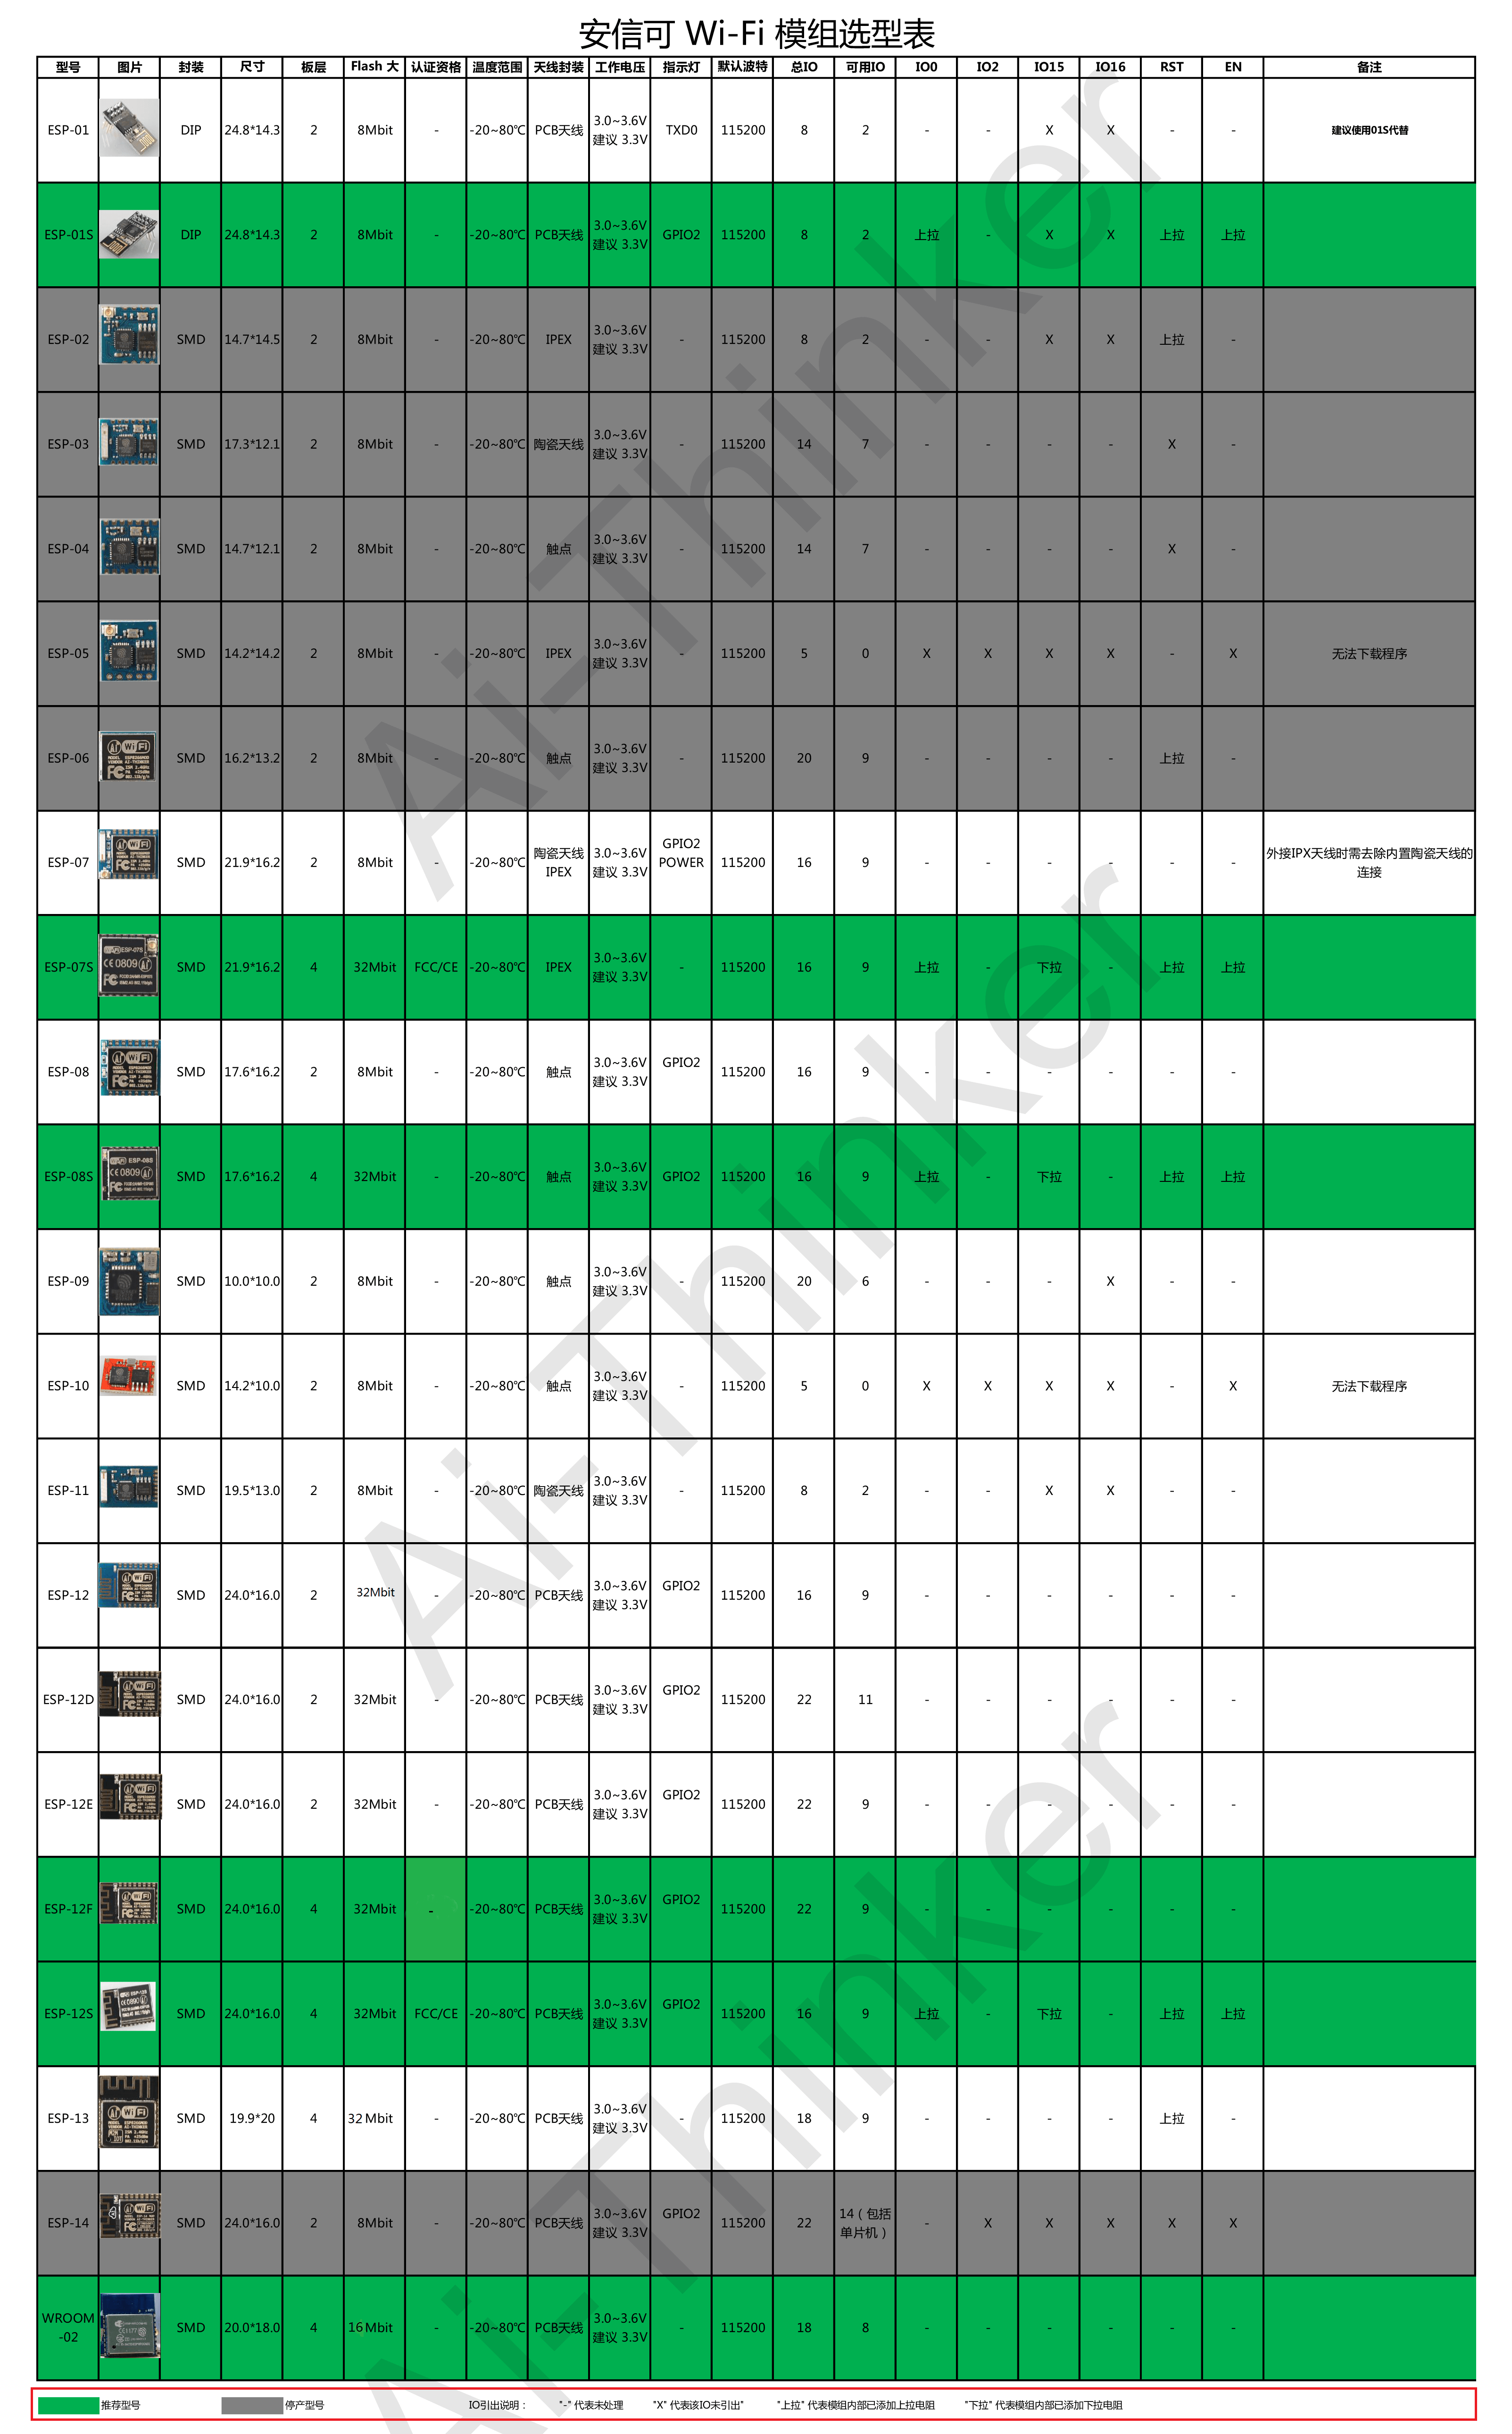 esp8266_module_list.png